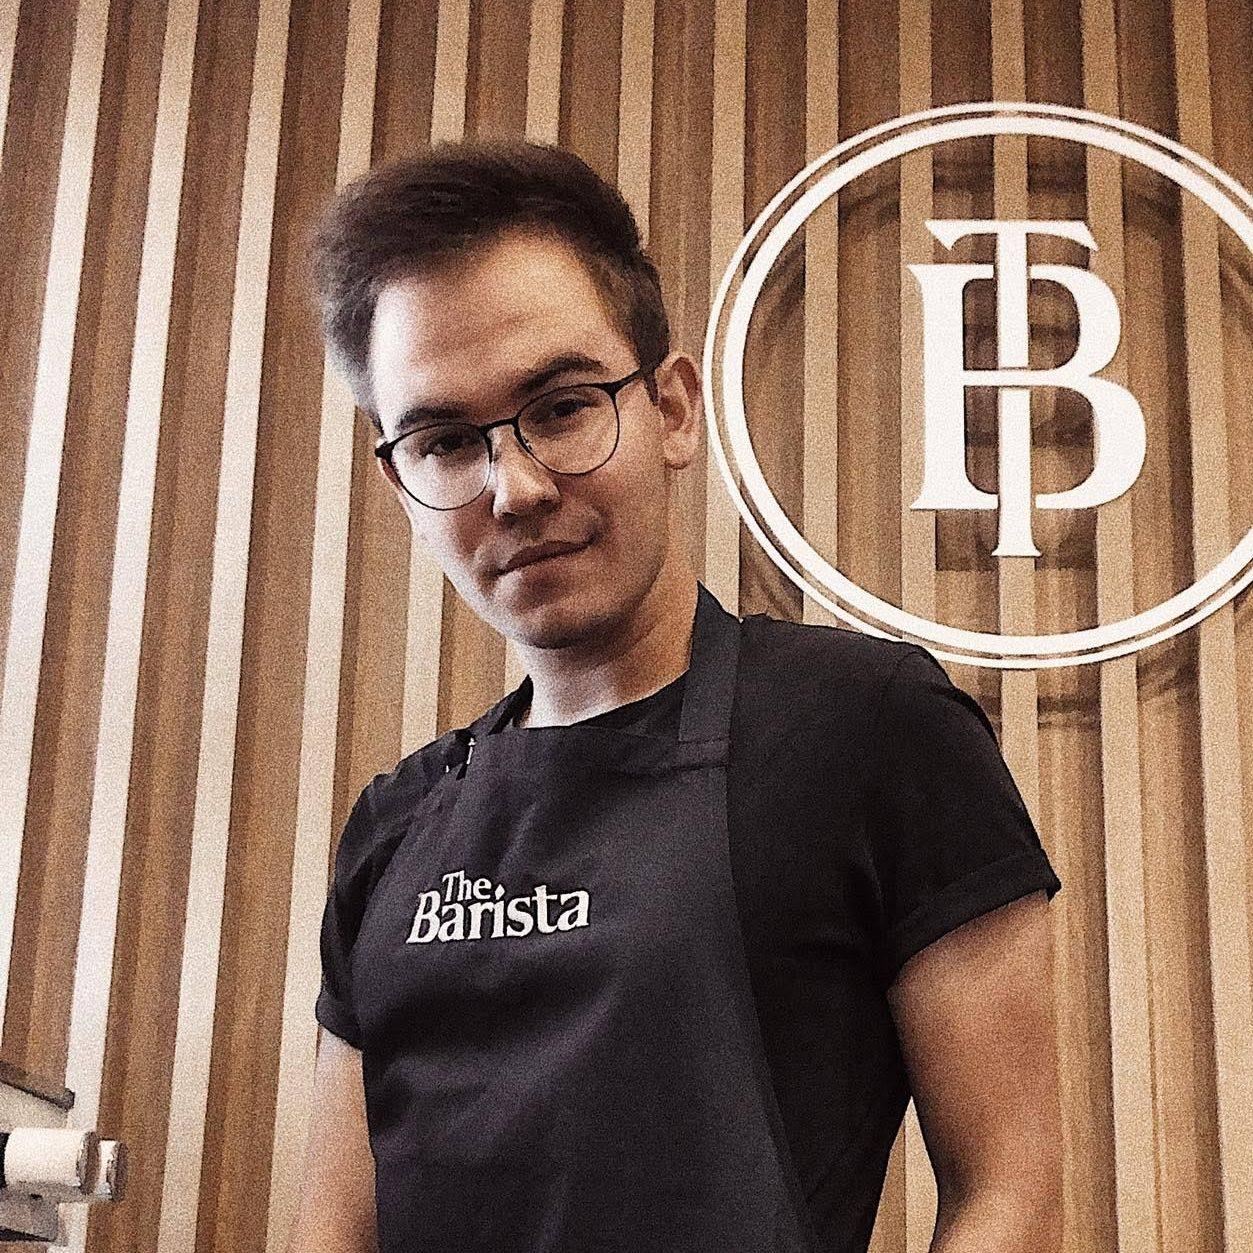 Kamil-Slipko-barista-The-Barista